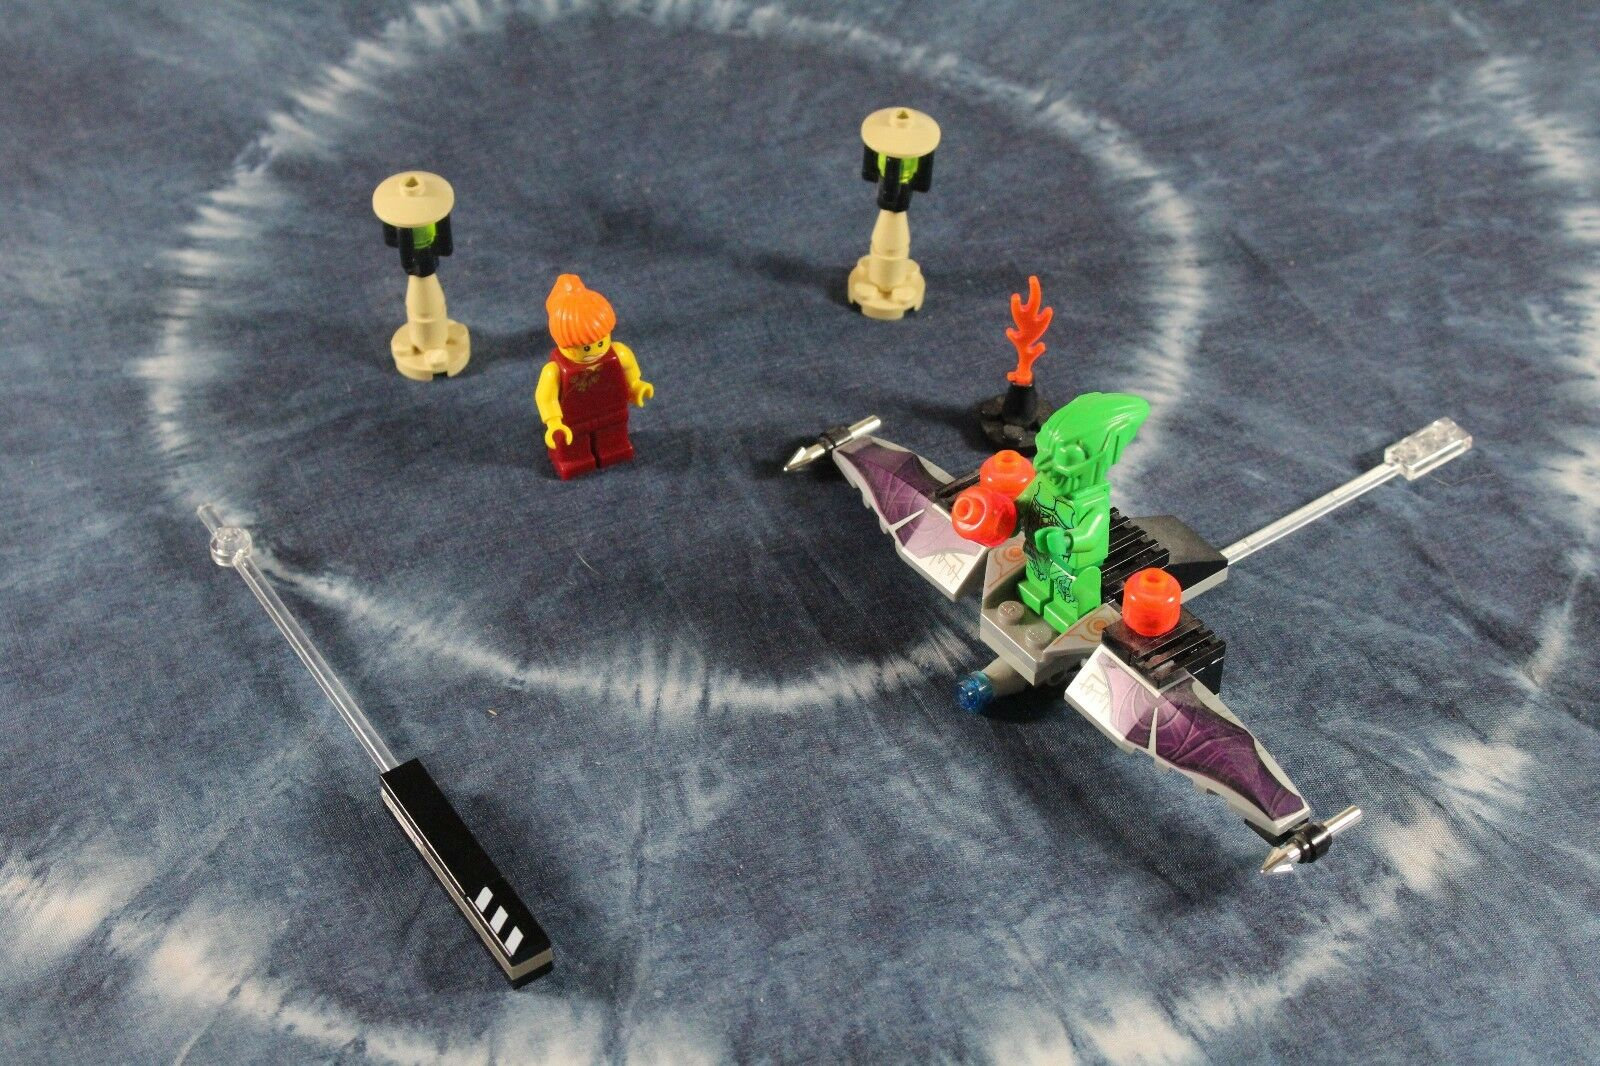 LEGO (1374) - STUDIOS - SPIDERMAN   GREEN GOBLIN - Includes Instructions. No Box